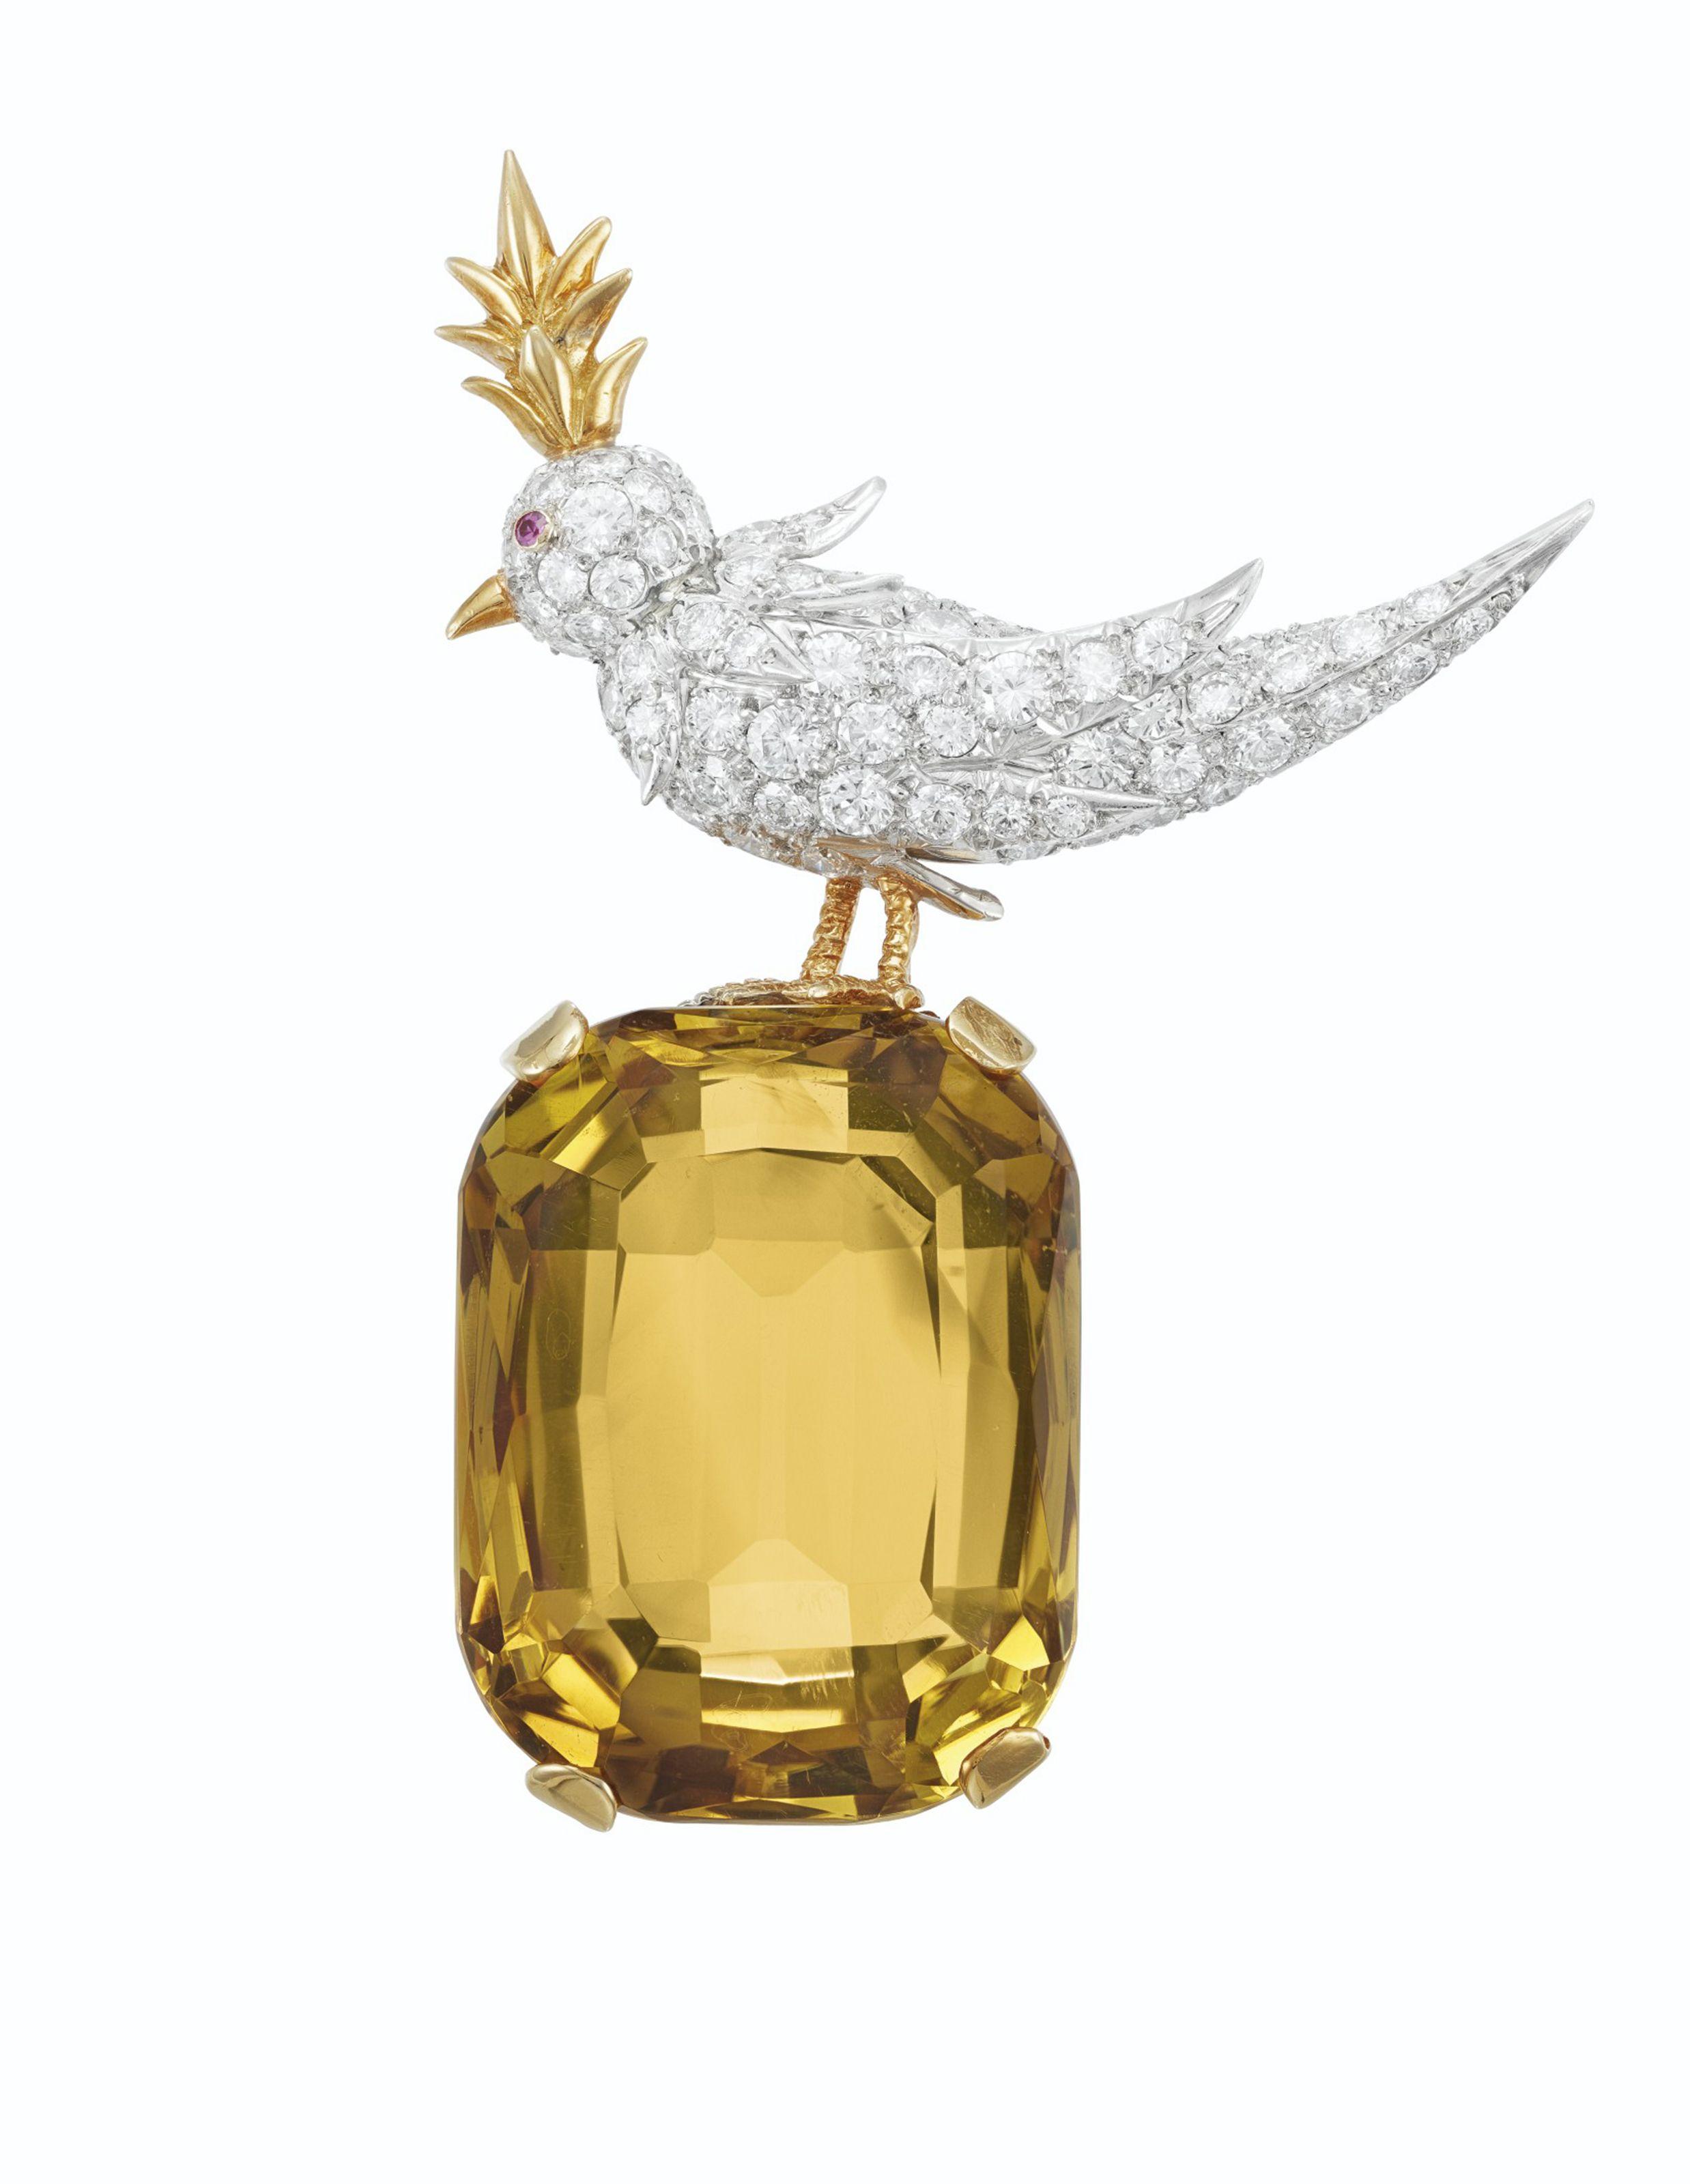 da89e6b84177b CITRINE, DIAMOND AND RUBY 'BIRD ON A ROCK' BROOCH, JEAN SCHLUMBERGER ...